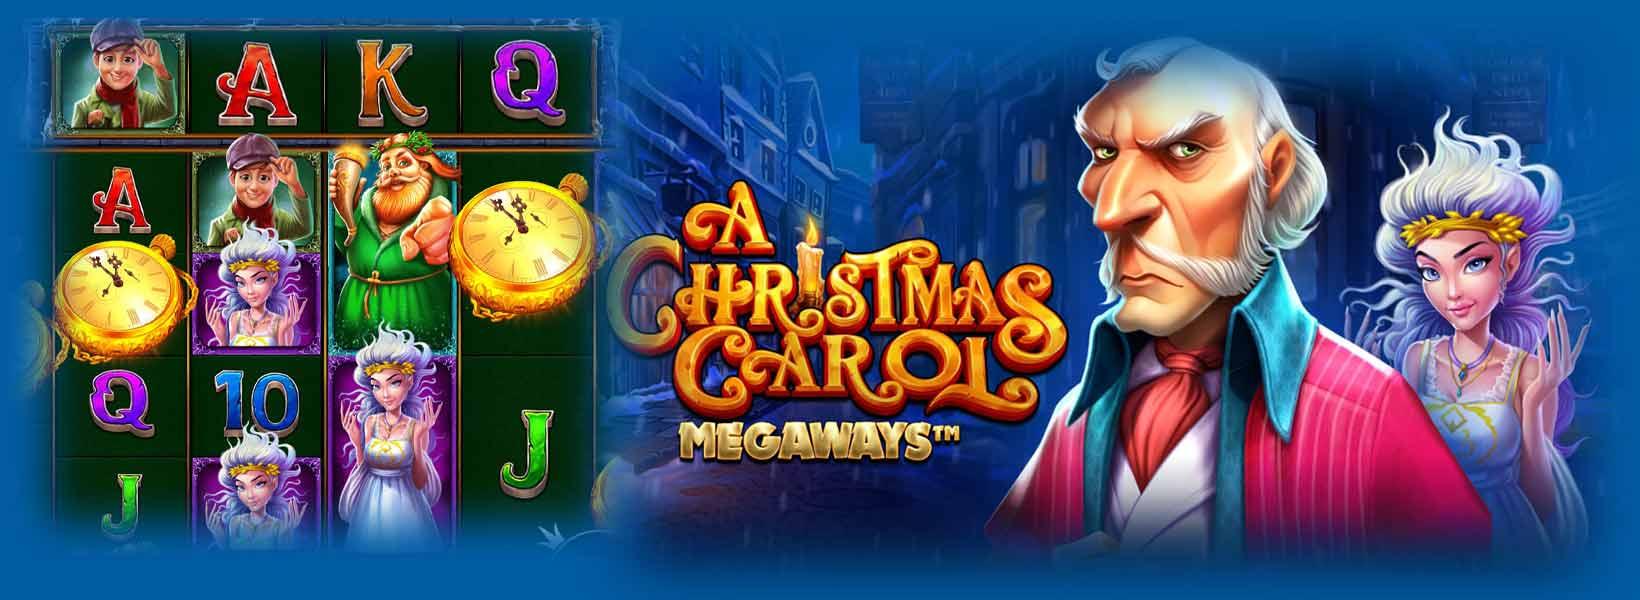 Christmas Carol Megaways slot